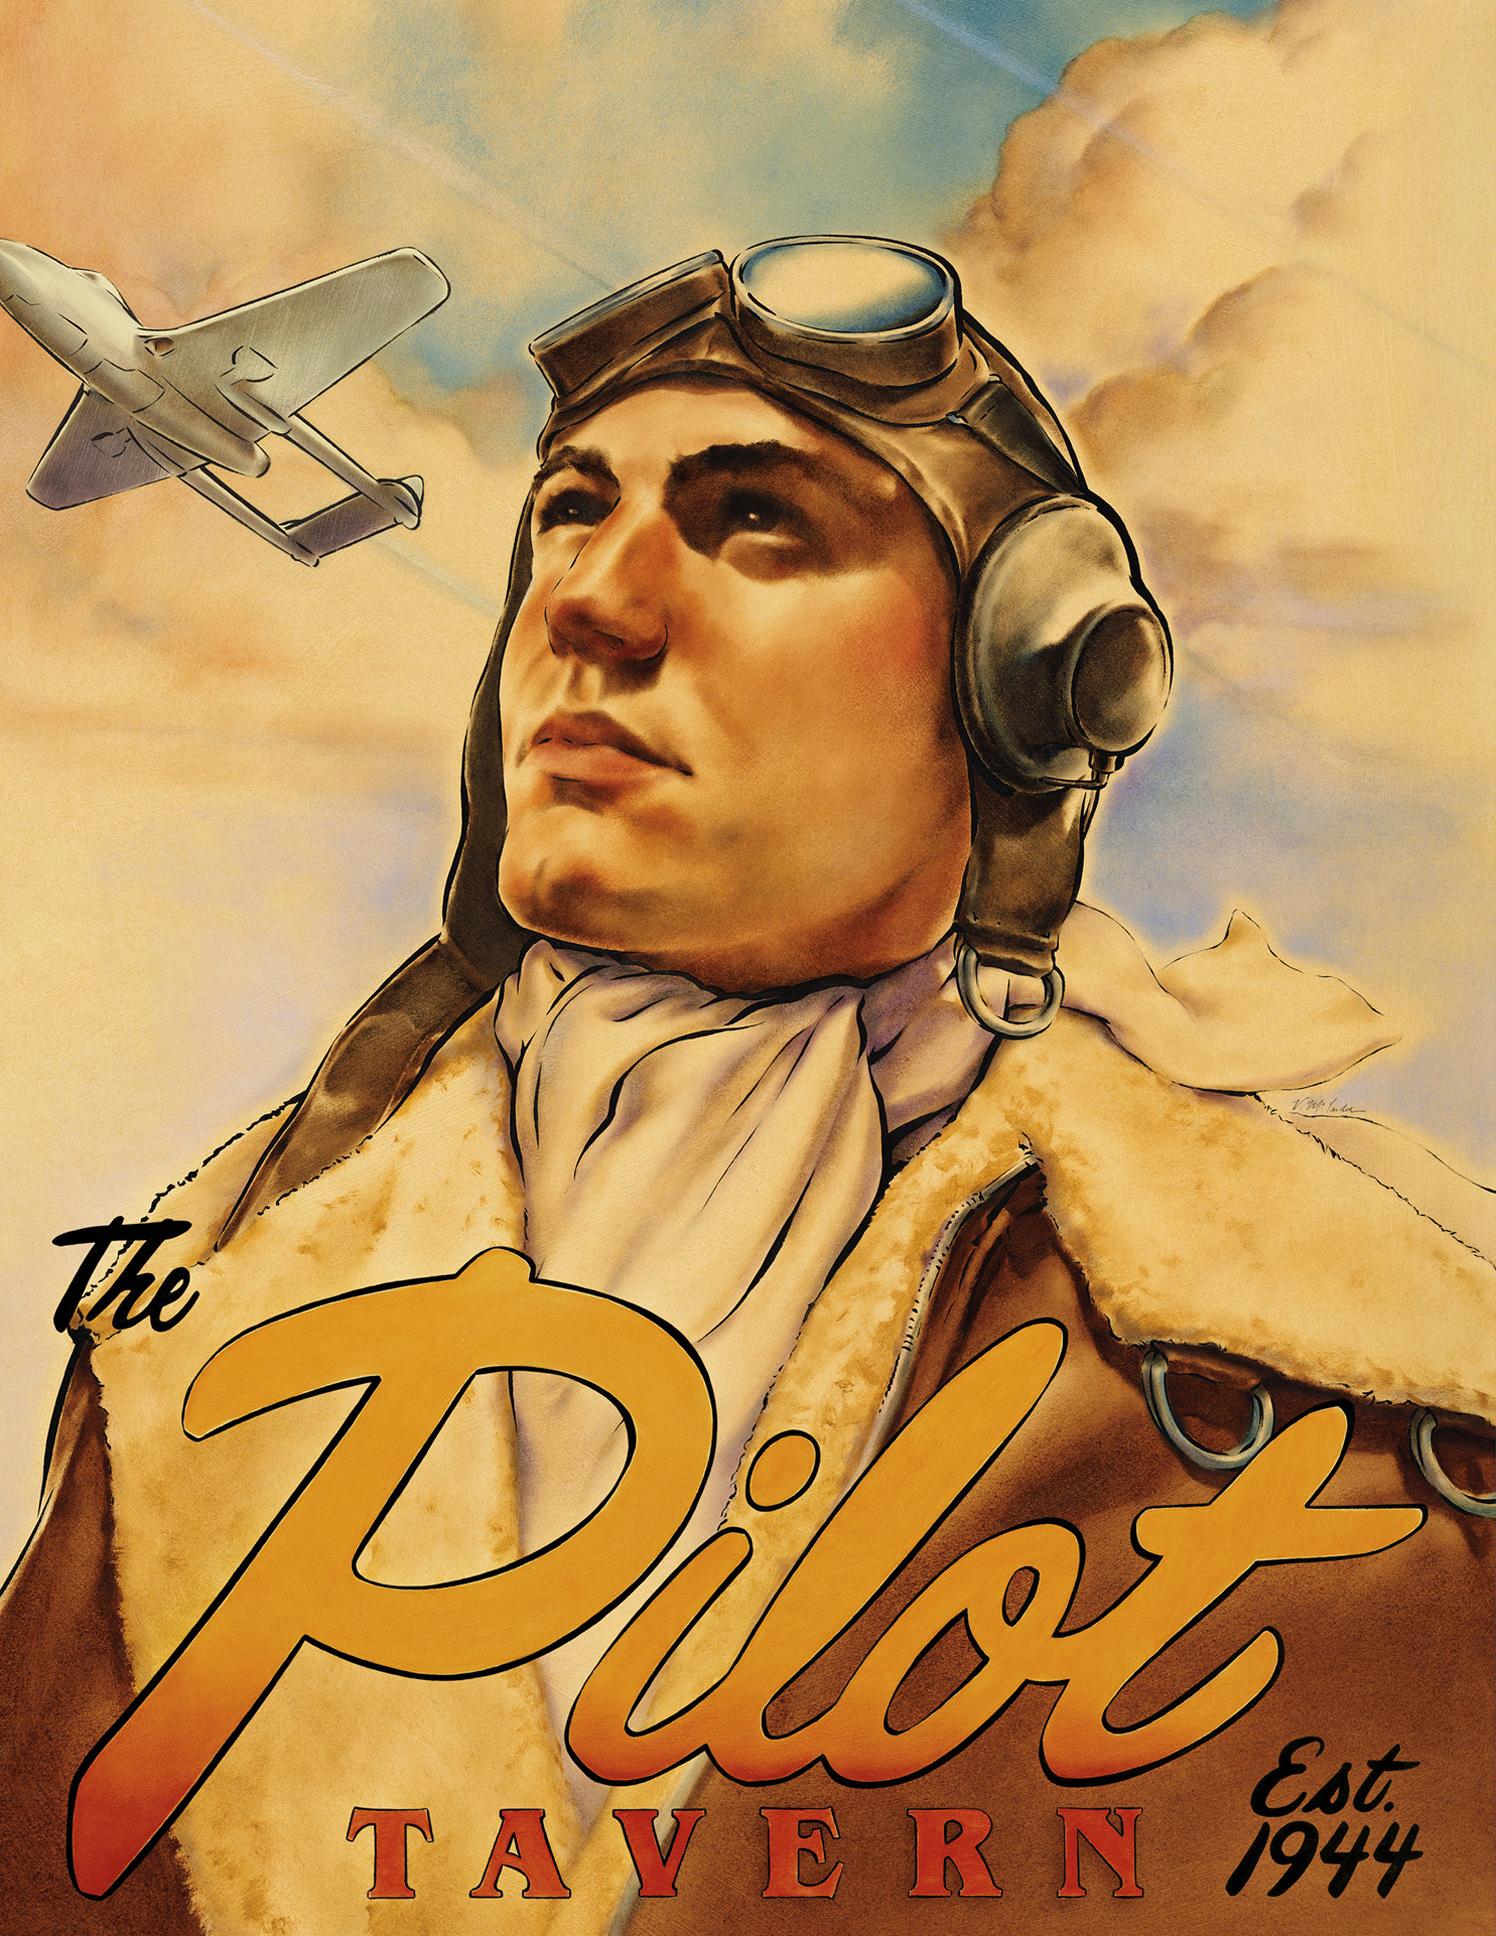 The Pilot Tavern